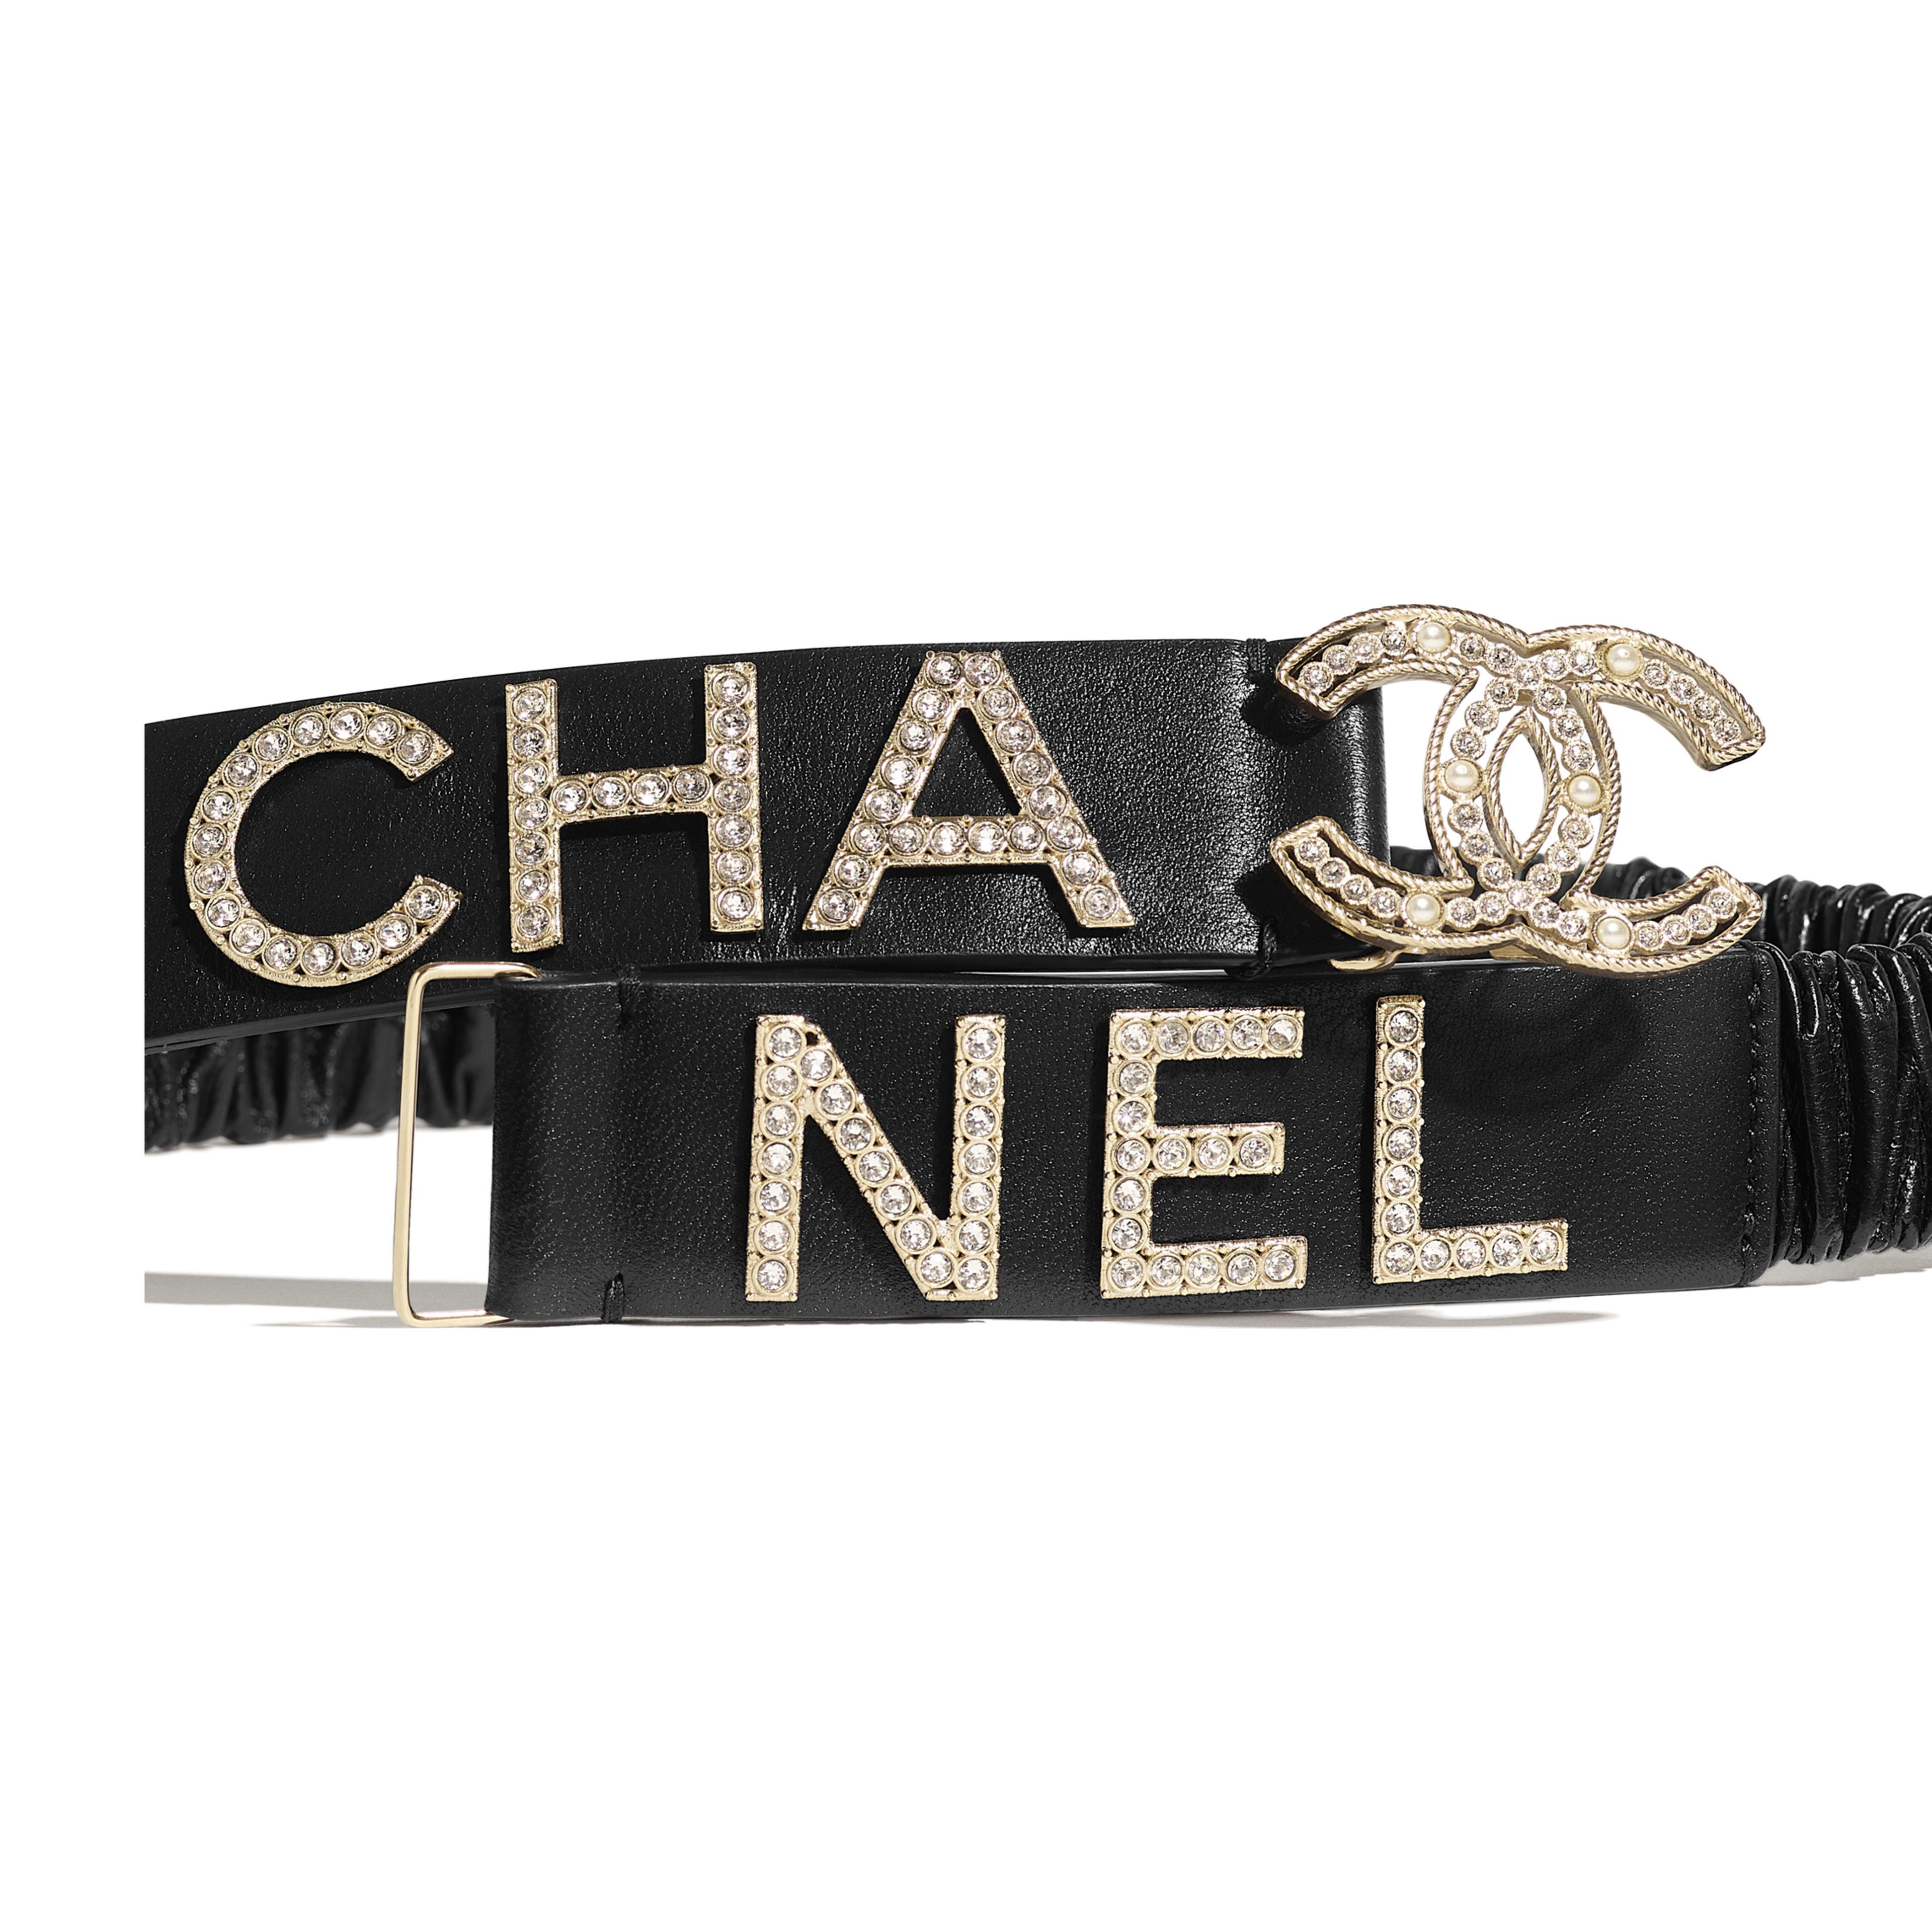 Belt - Black - Lambskin, Gold-Tone Metal, Strass & Glass - Alternative view - see full sized version